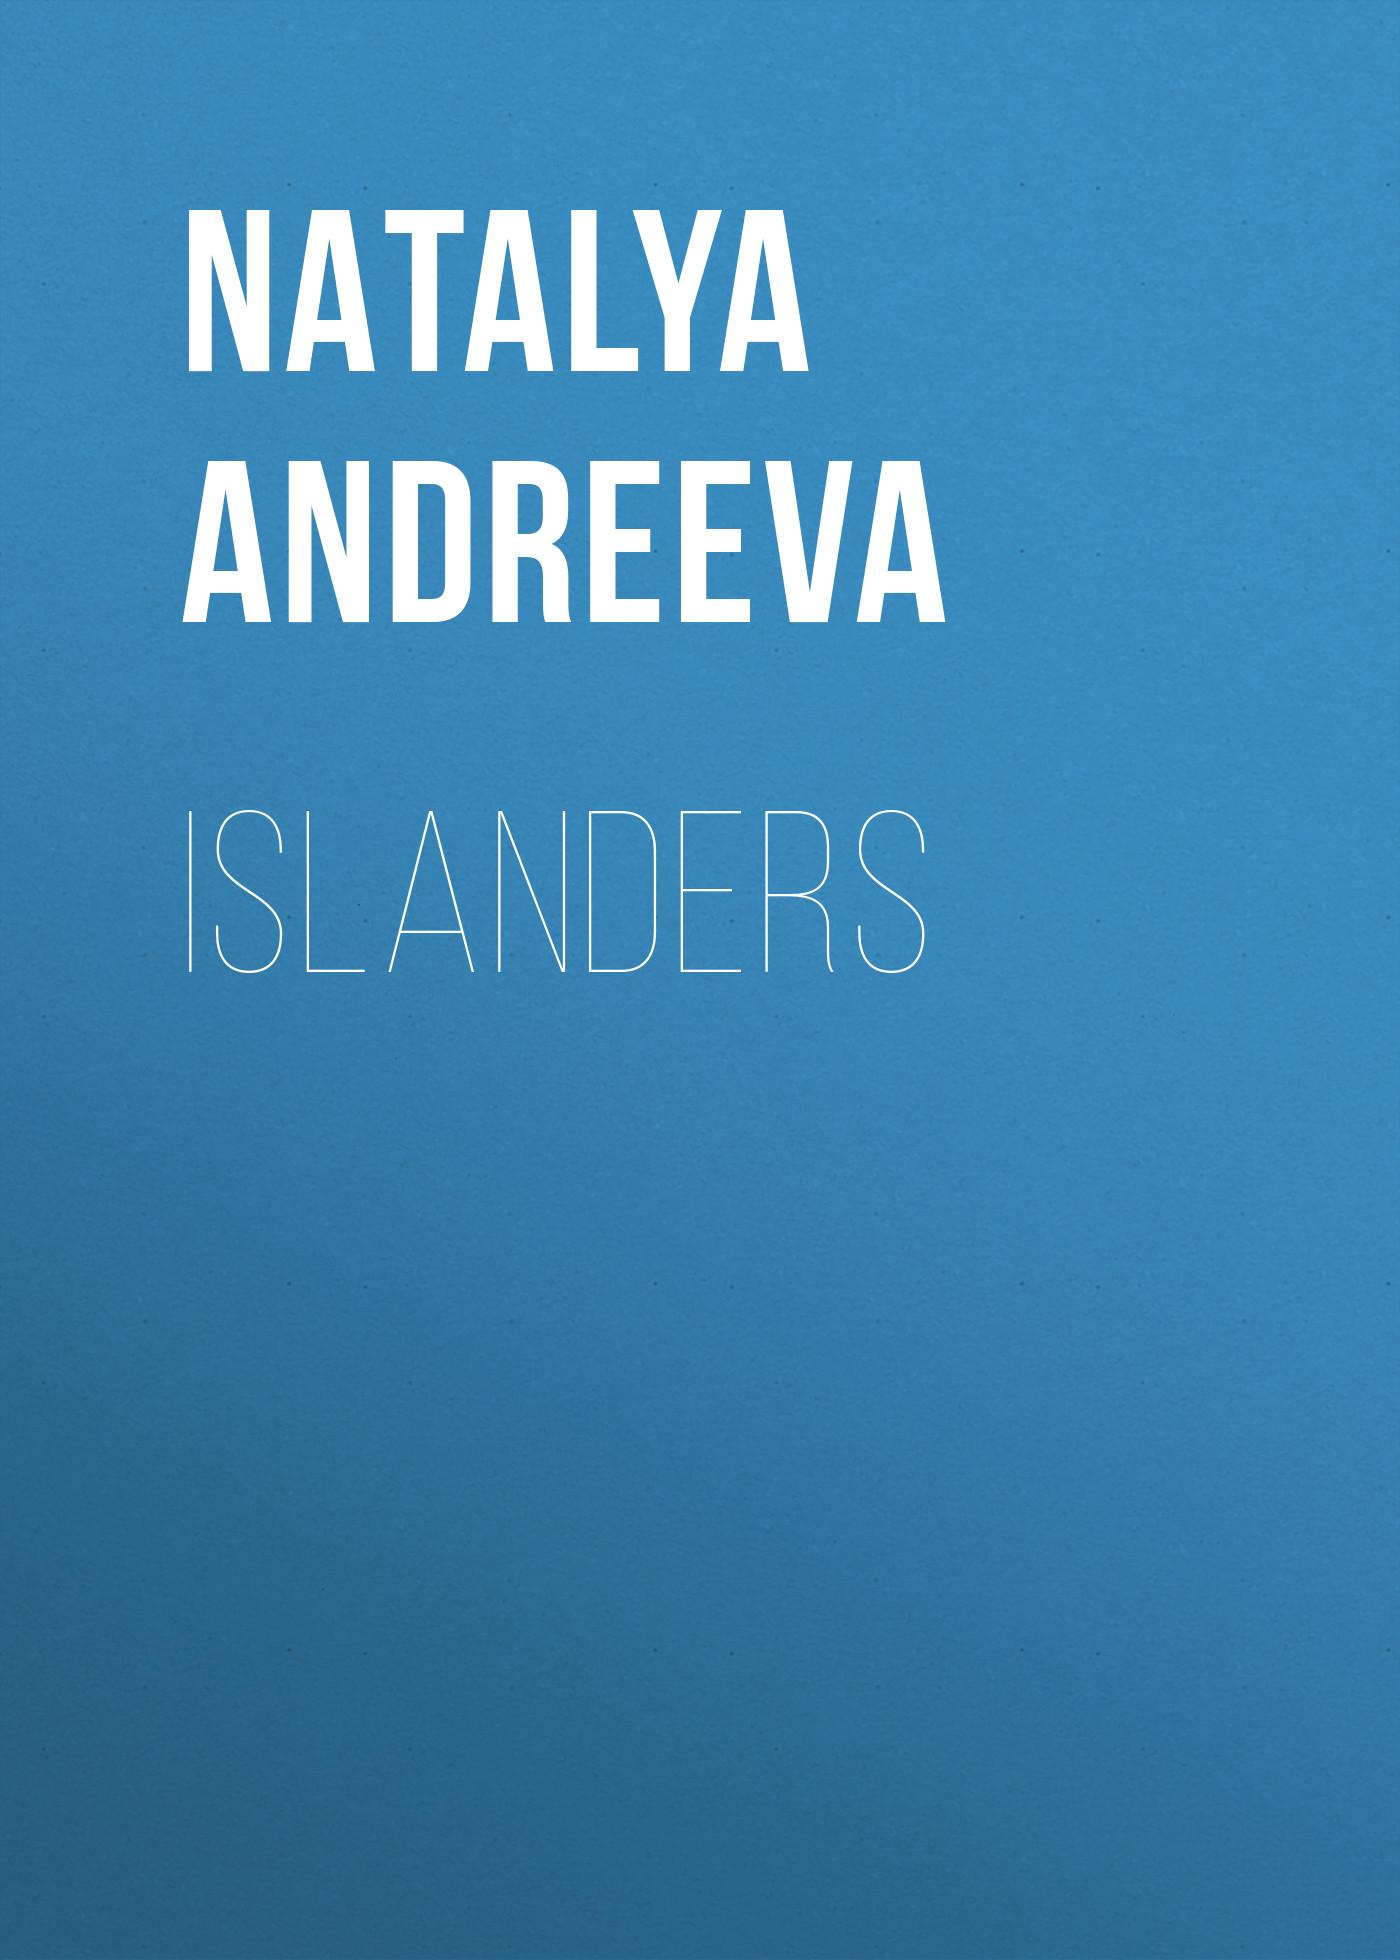 цена на Наталья Андреева Islanders